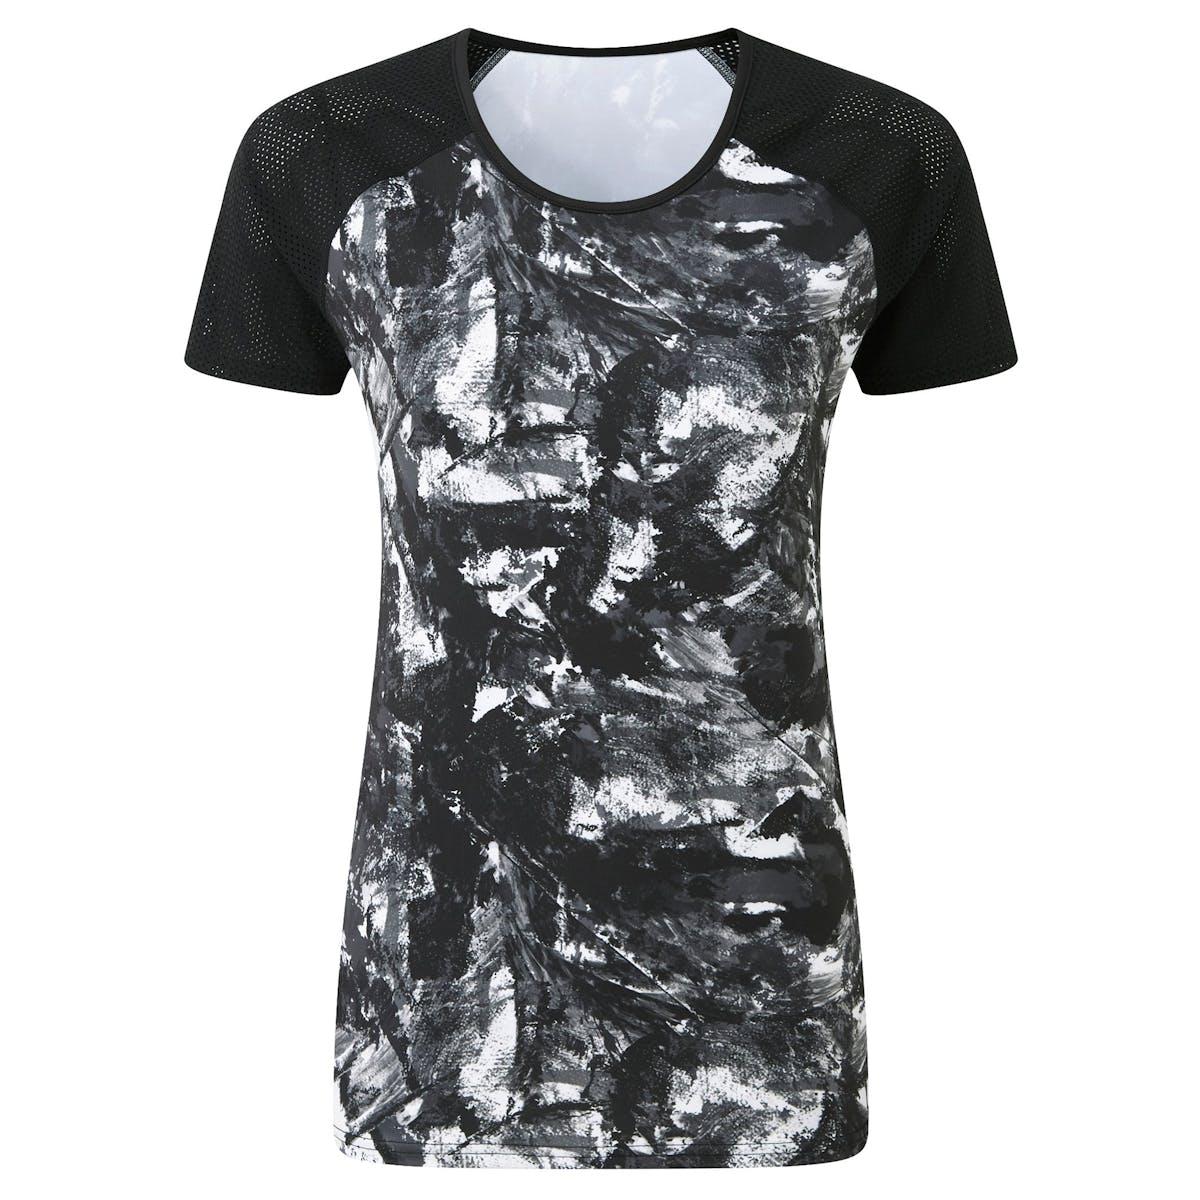 3b9216a3 Women's Short Sleeved Print Running T-shirt - Print Design - TribeSports  Sportswear & Apparel - Tribesports